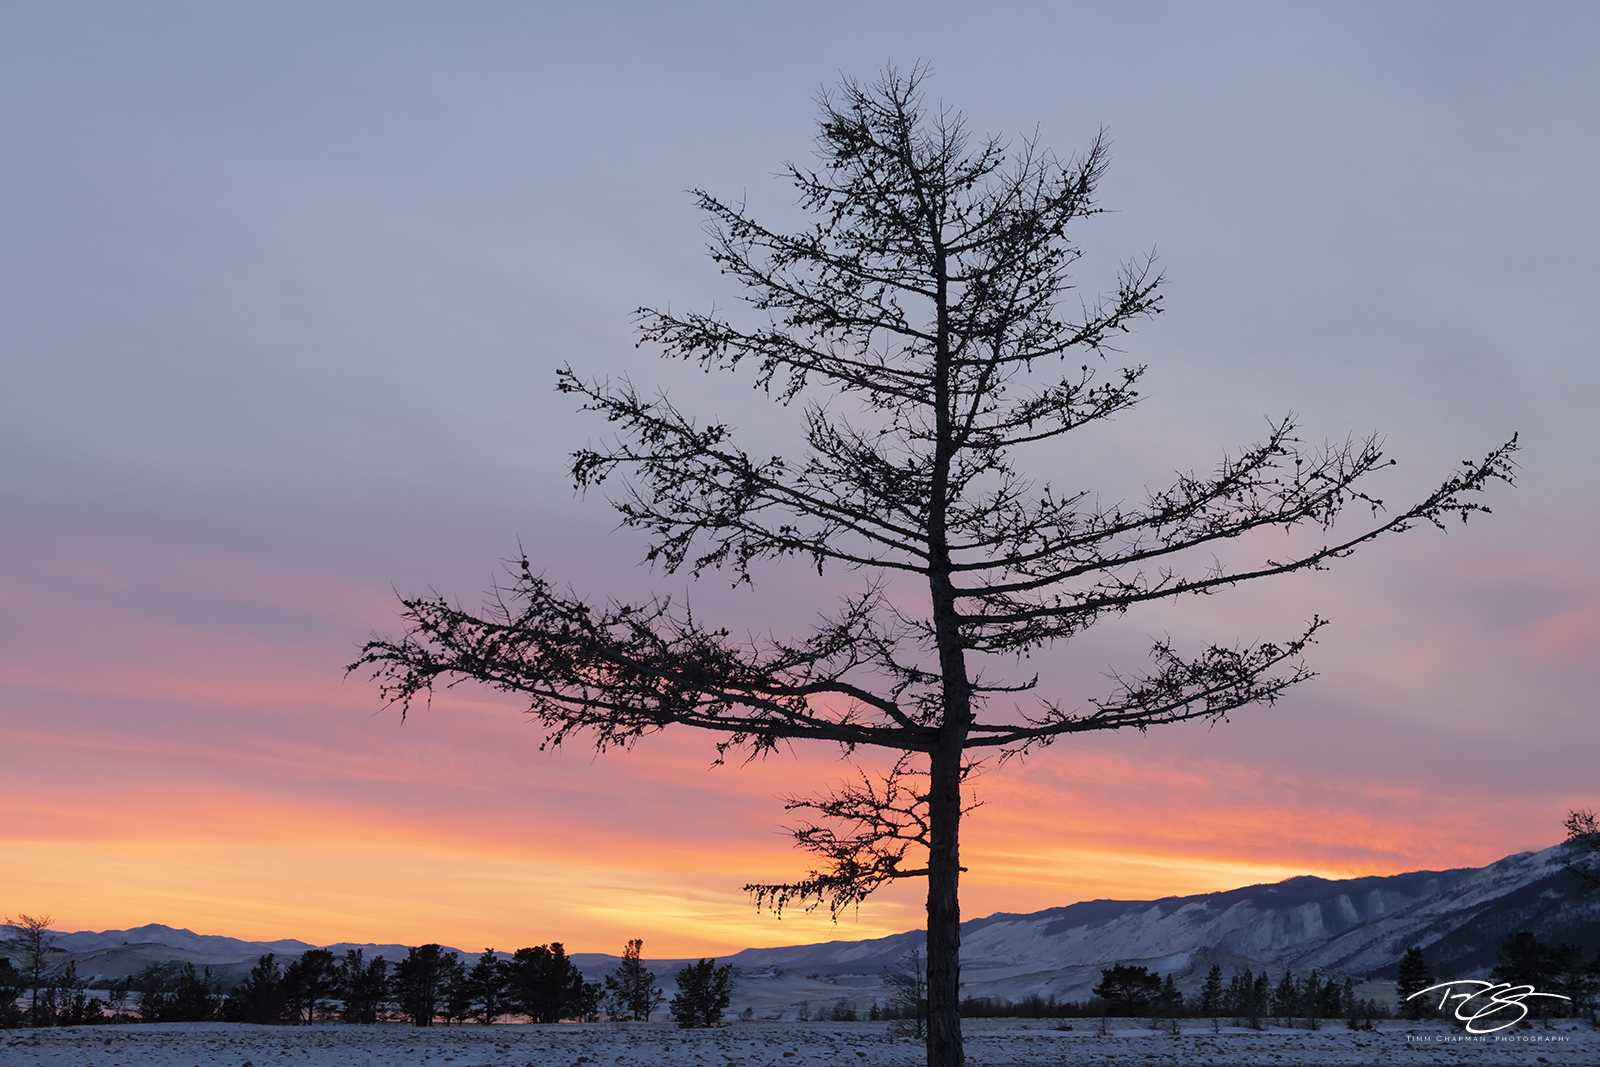 russia, lake baikal, siberia, ice, winter, Pribaikalsky National Park, Прибайкальский национальный парк, Pribaykalski National Park, tree, sunset, silhouette, photo